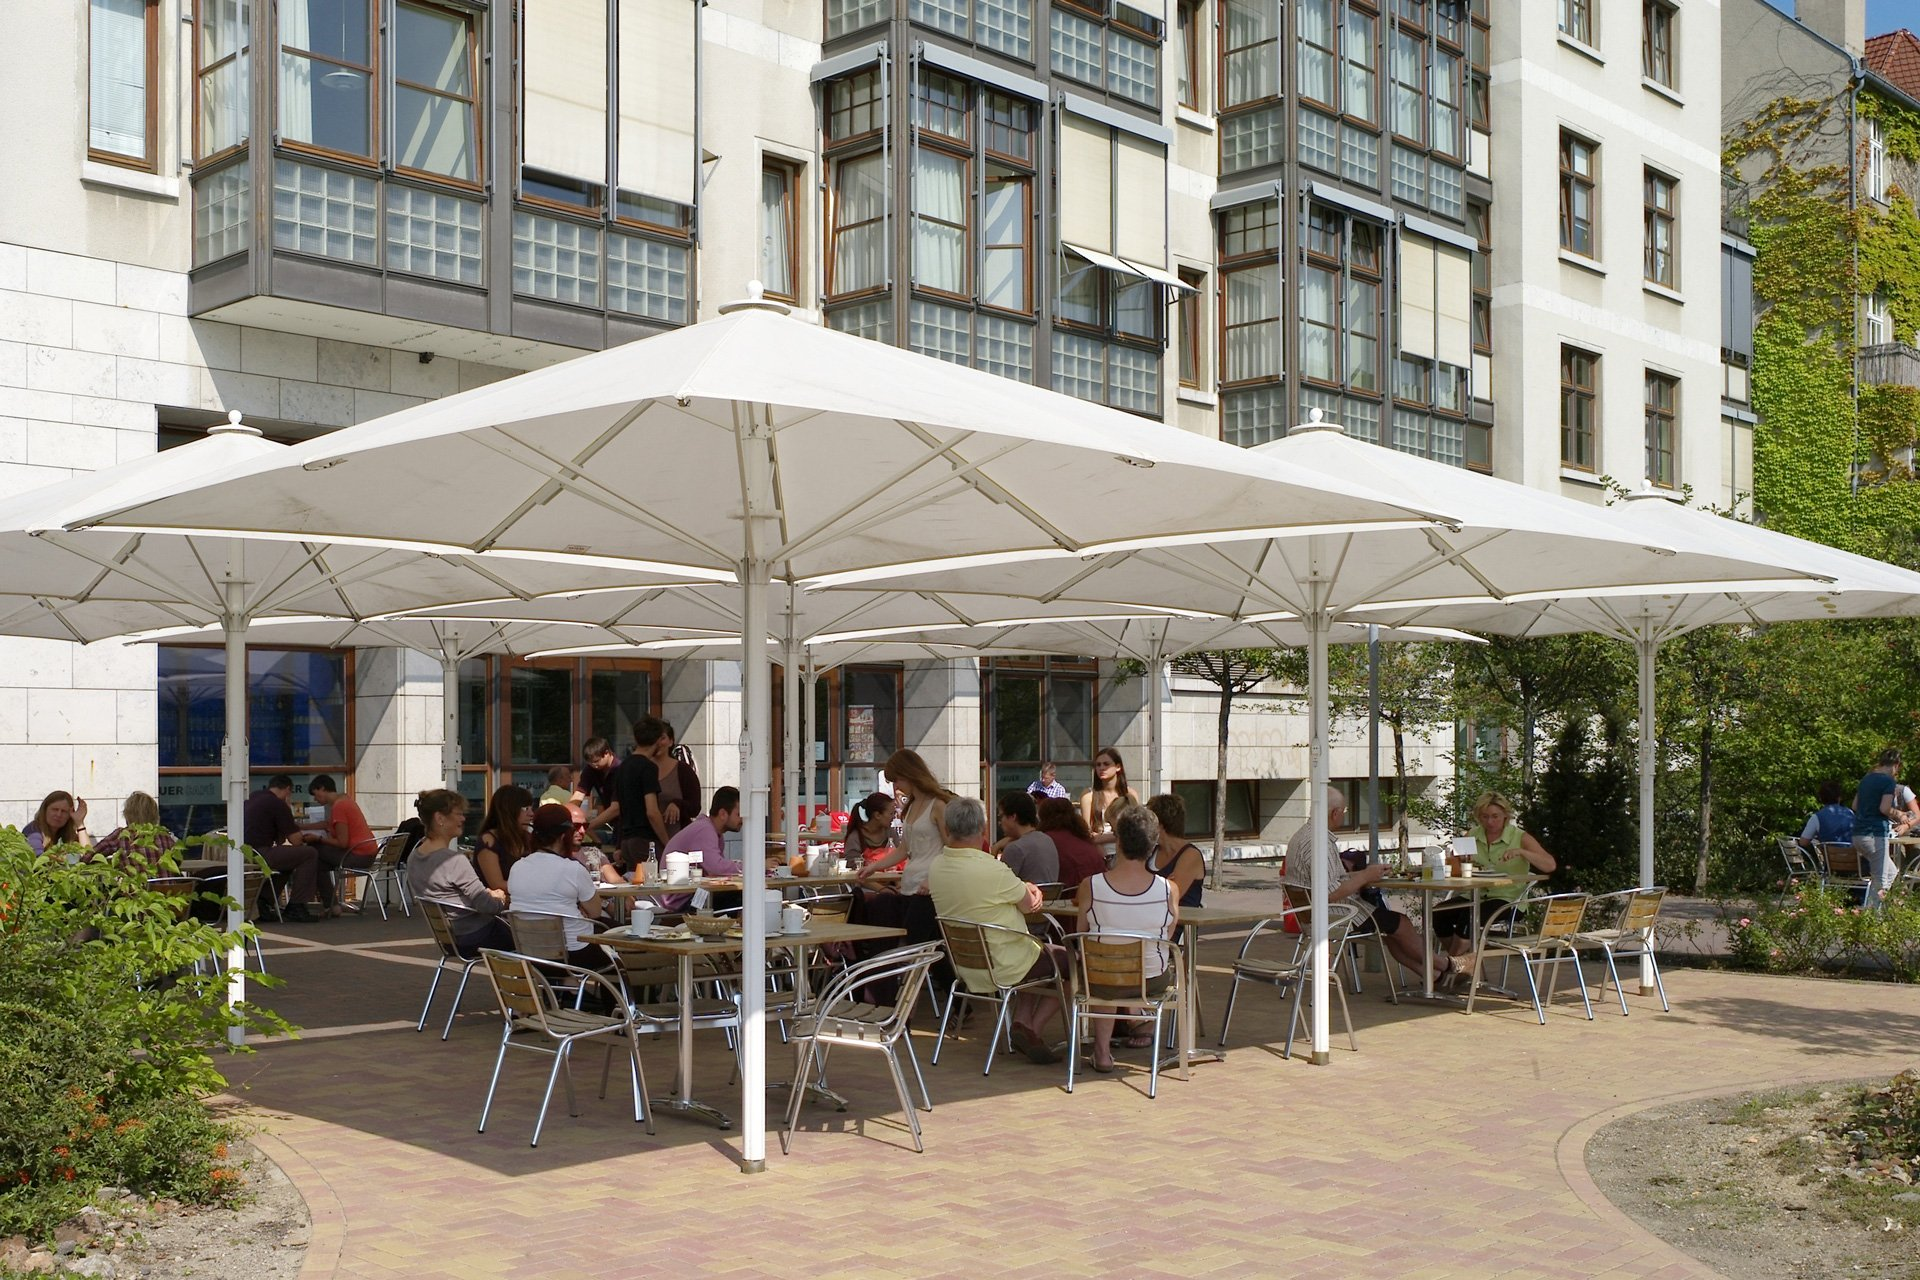 Mauercafé Berliner Mauer Terrasse